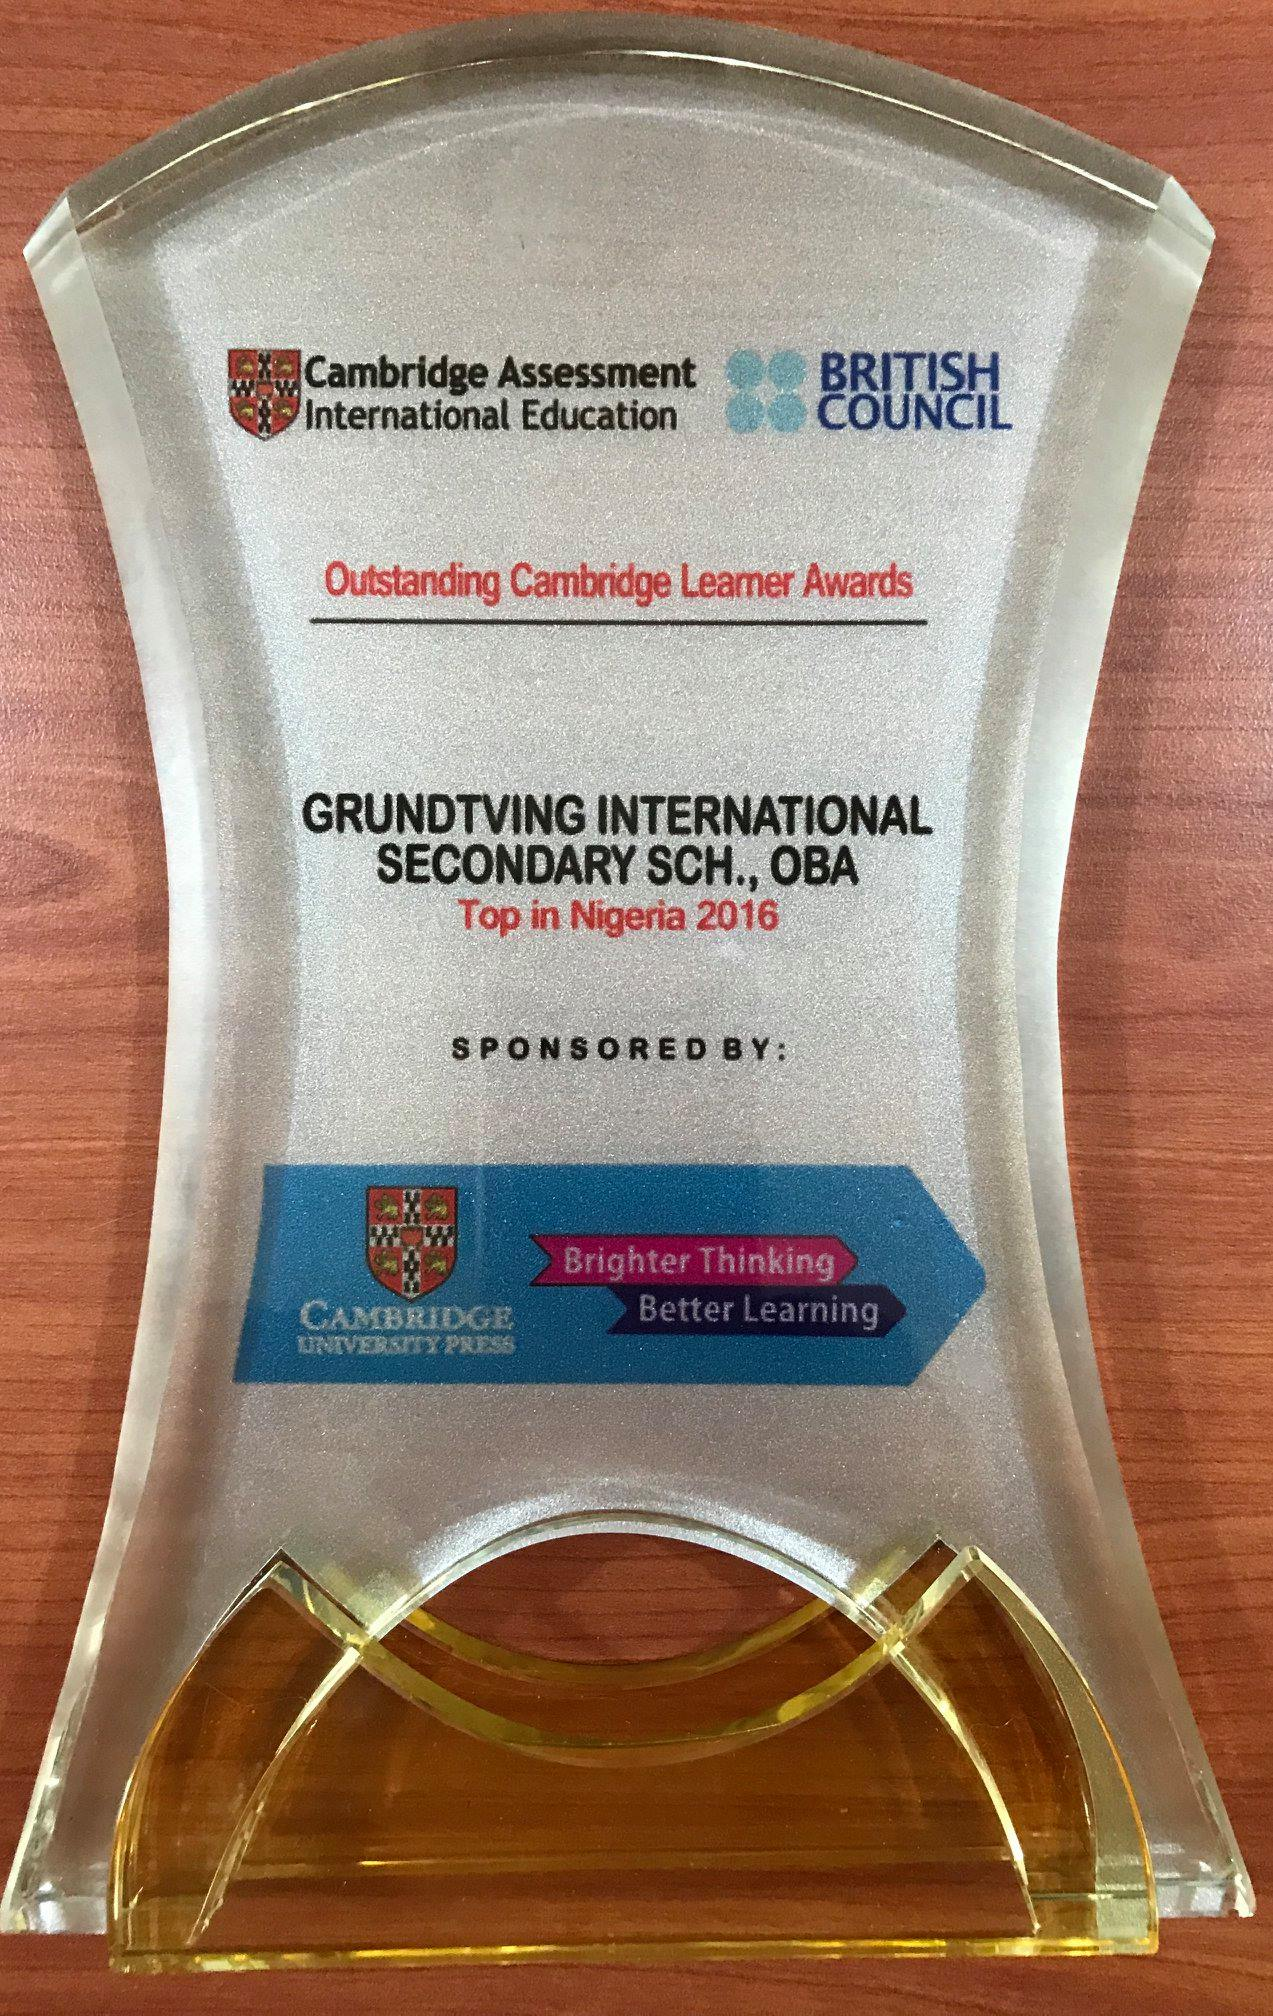 Outstanding Cambridge Learner Awards 1